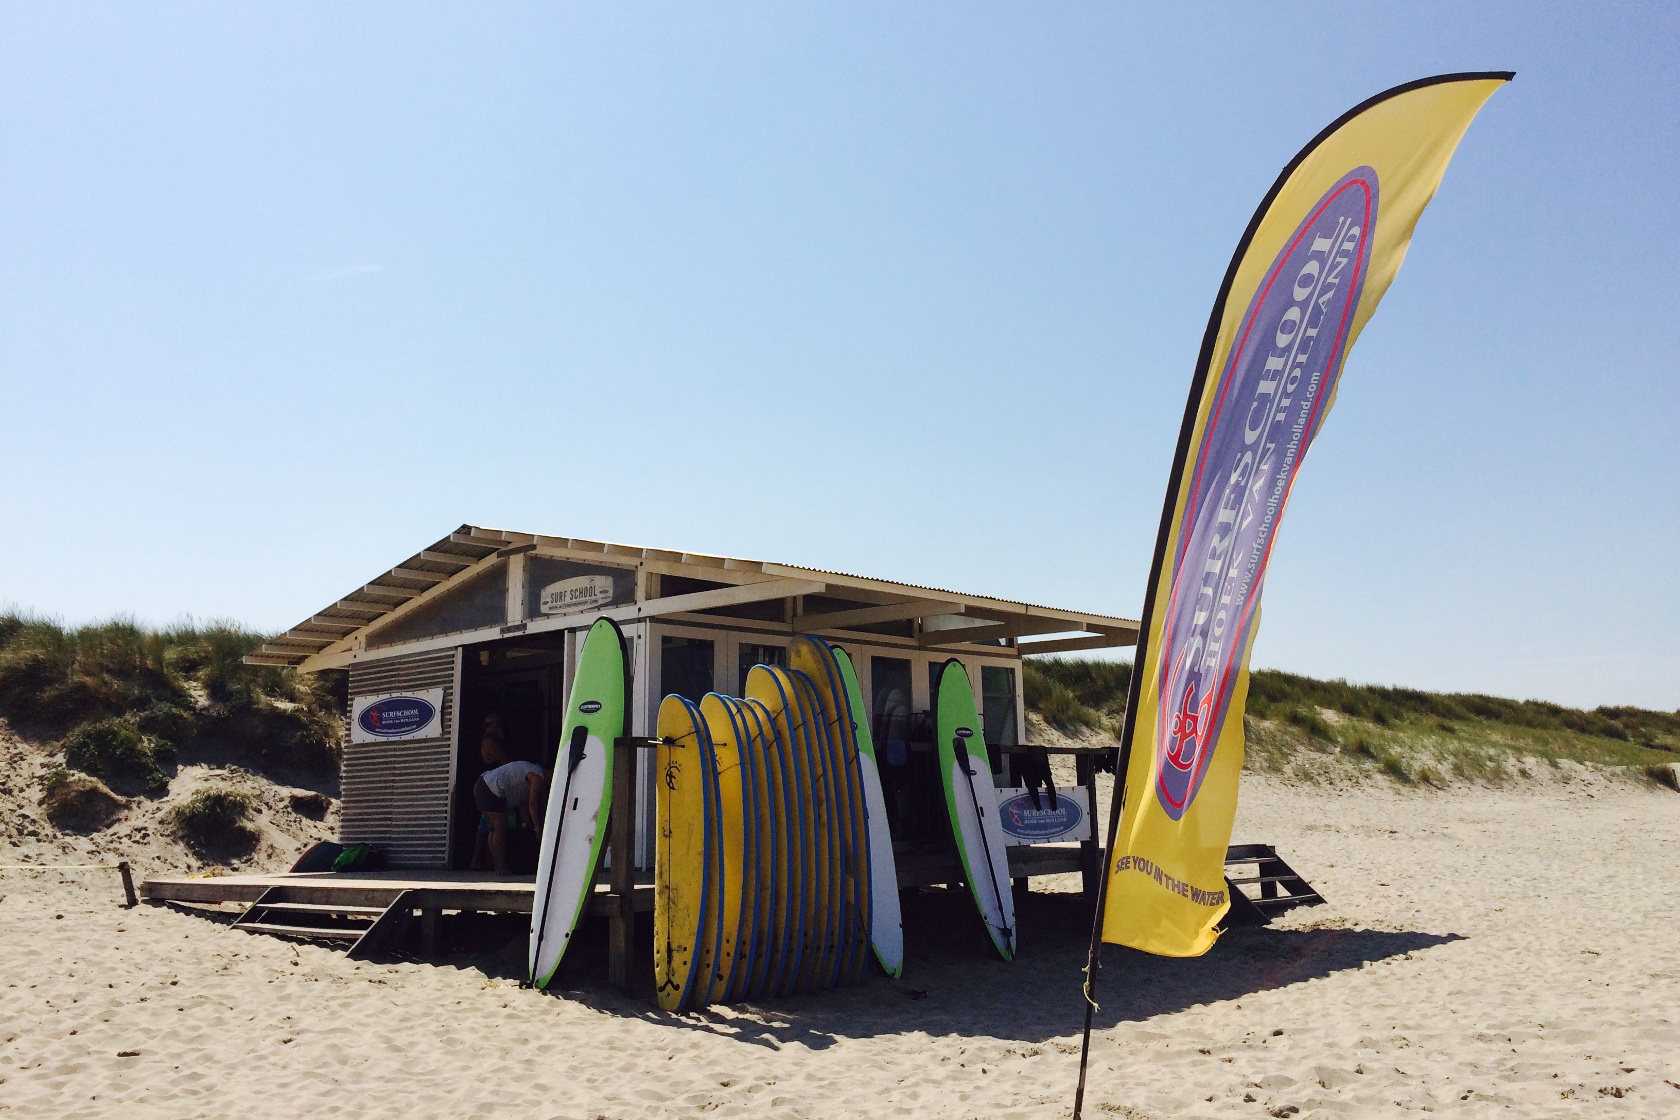 Surfschool Hoek van Holland